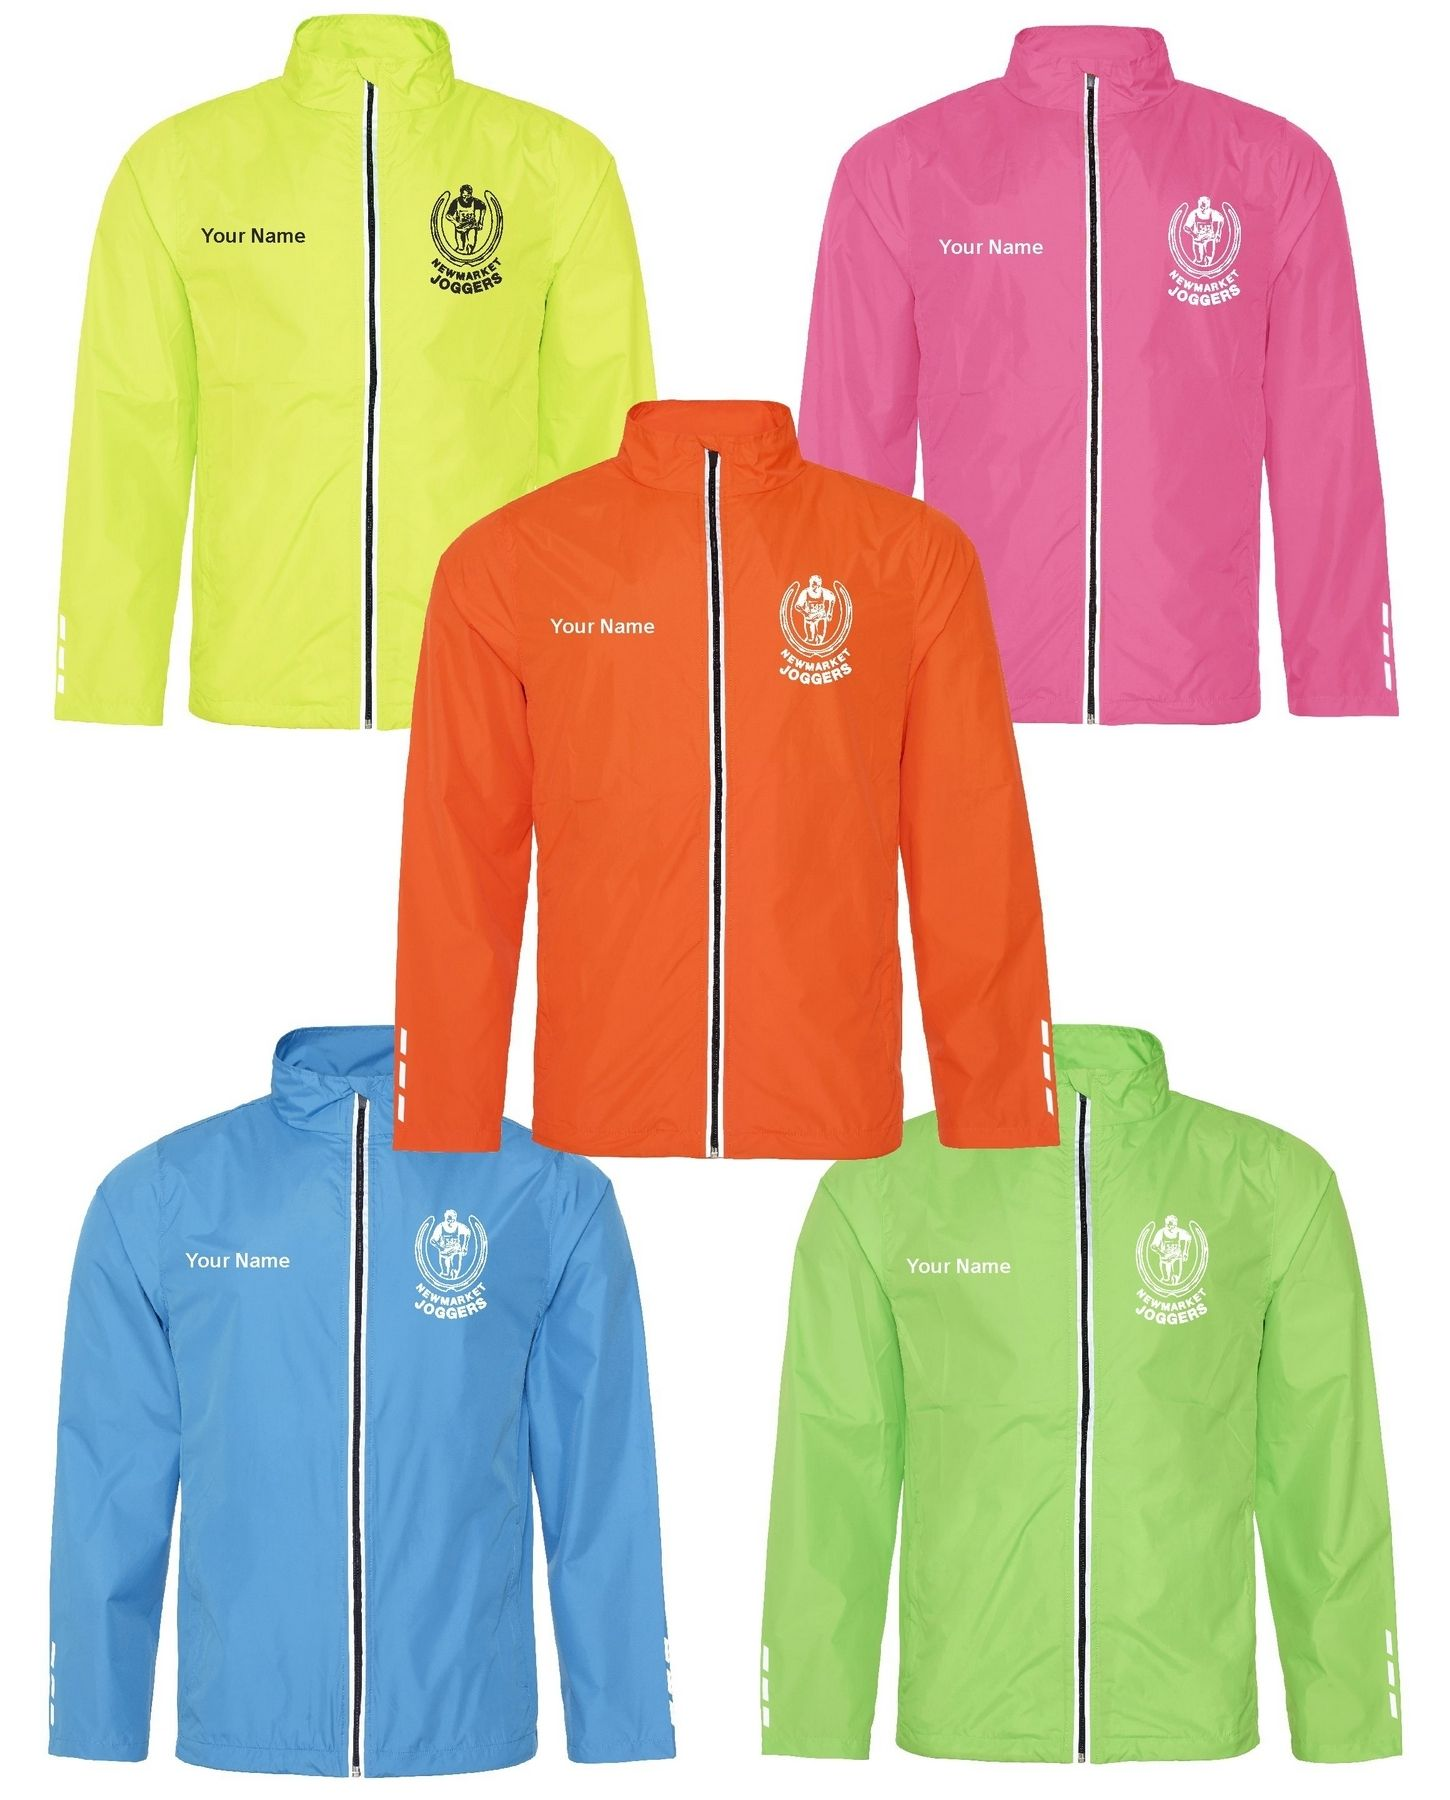 Newmarket Joggers – Running Jacket (Unisex)